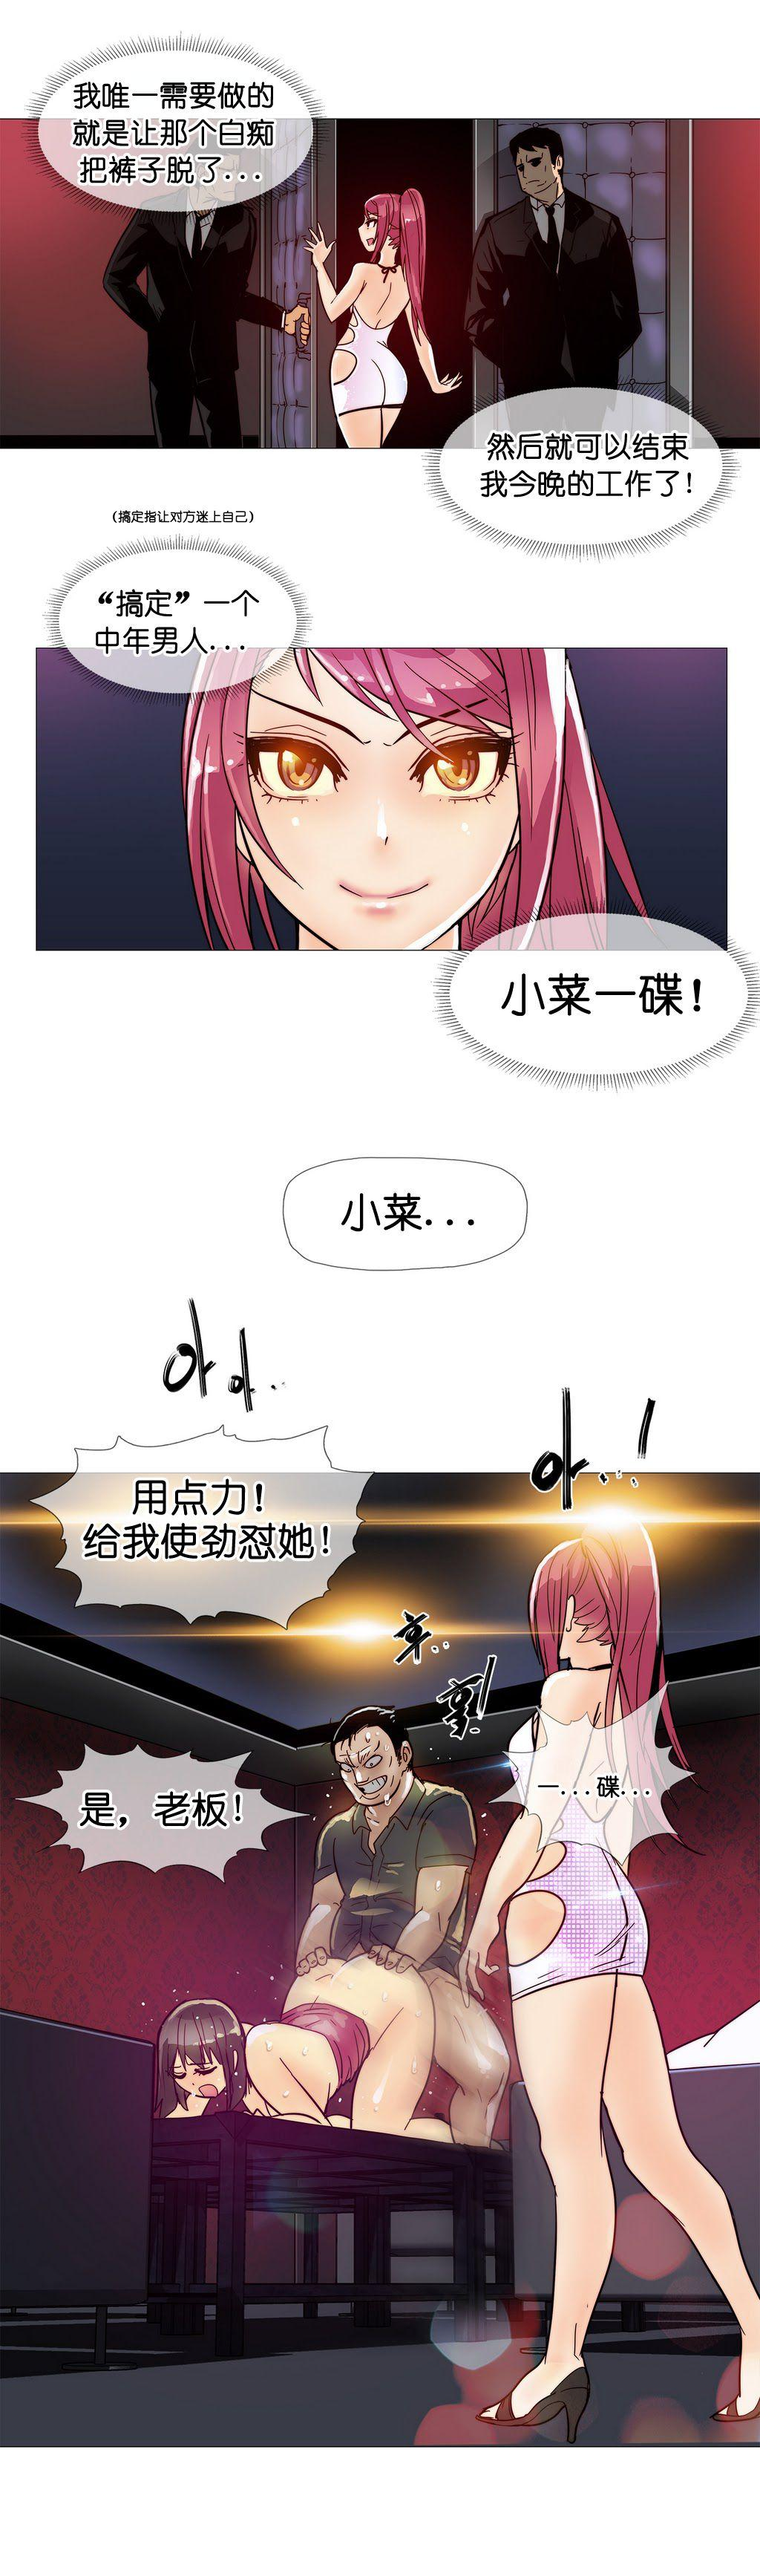 HouseHold Affairs 【卞赤鲤个人汉化】1~33话(持续更新中) 195